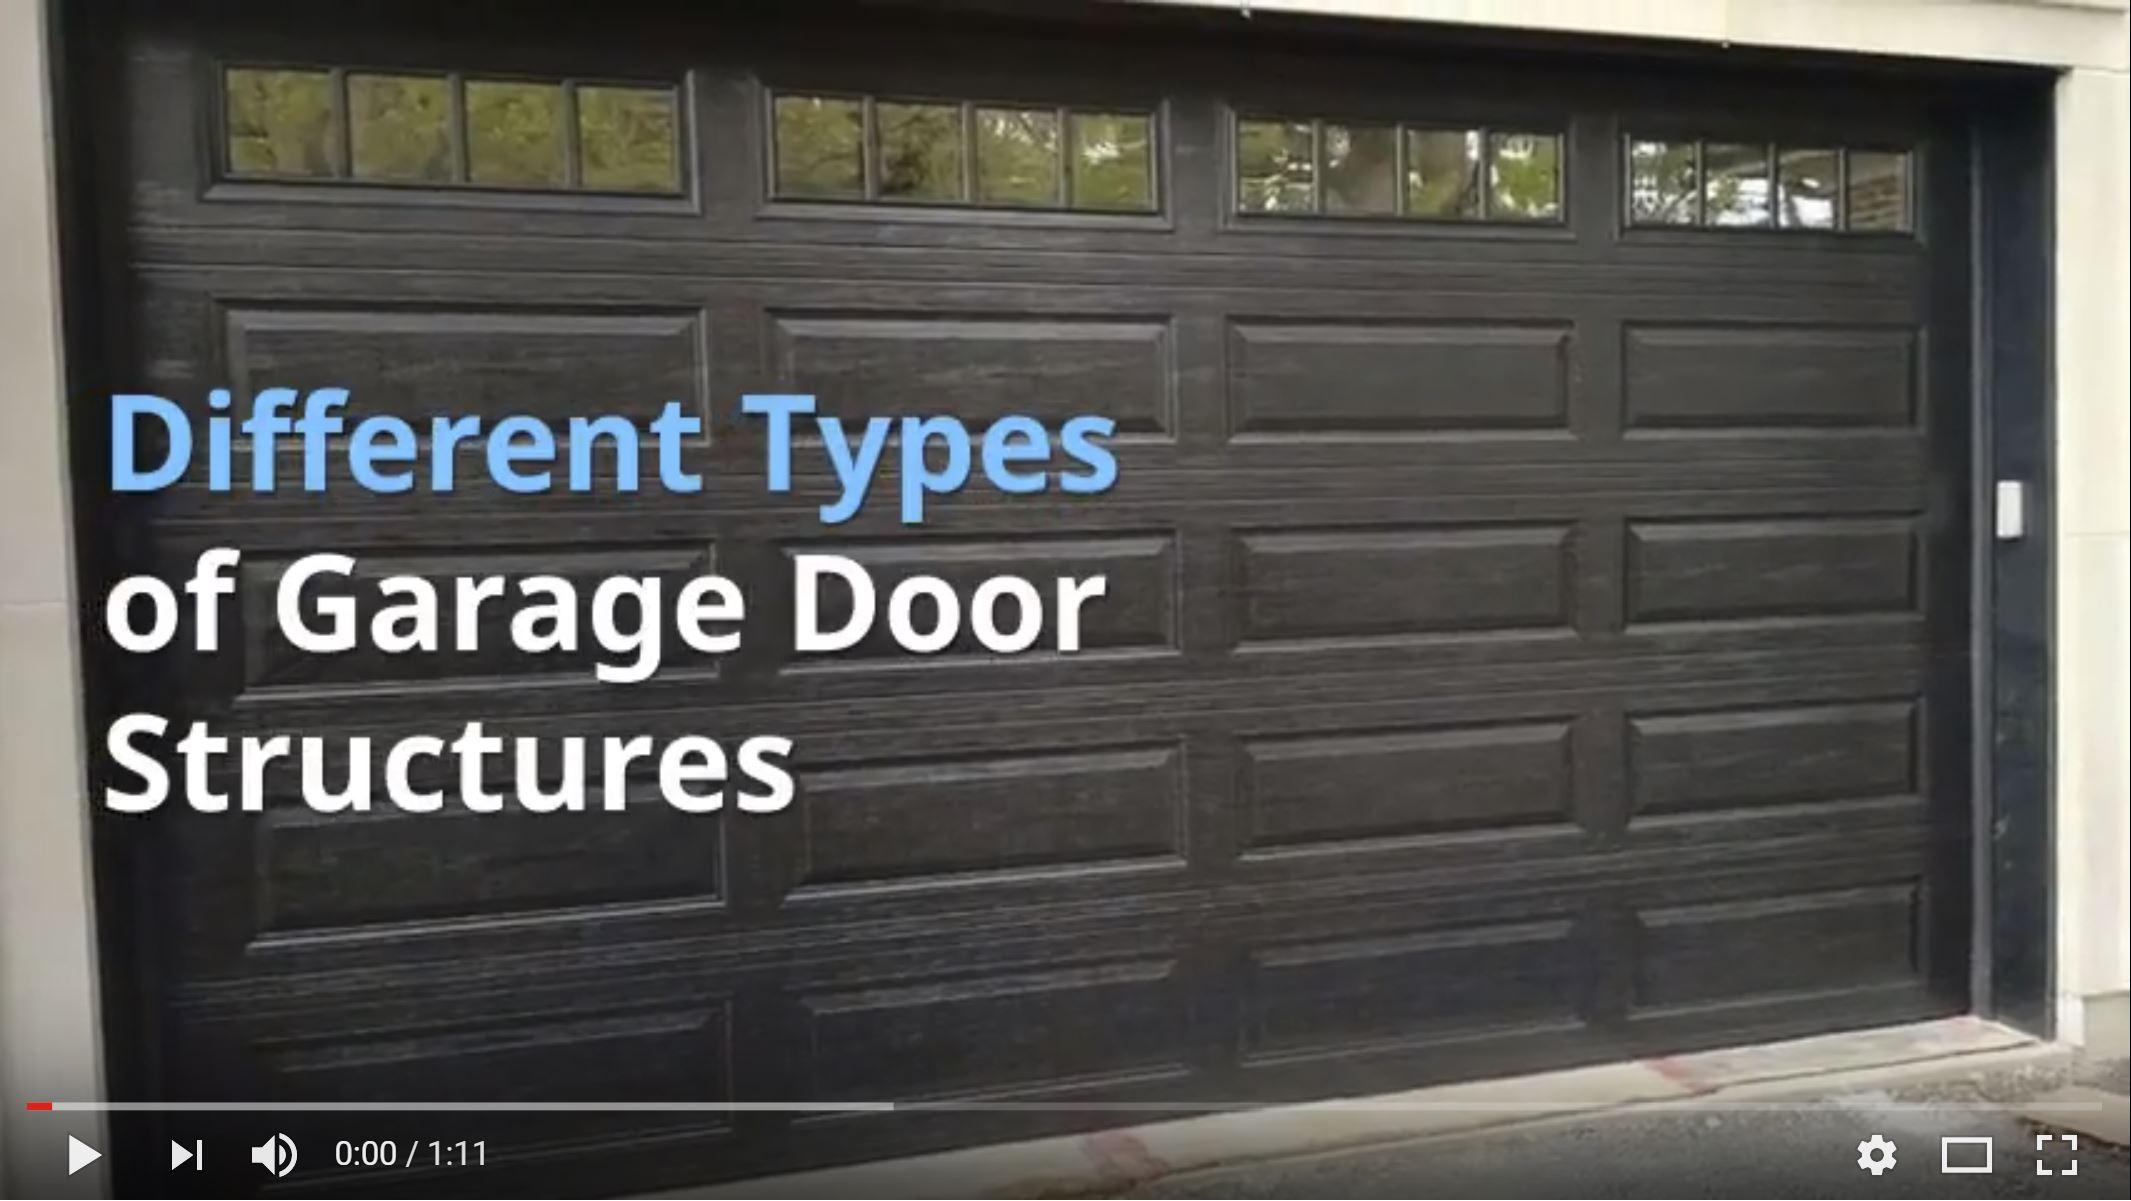 Different Types Of Garage Door Structures   Garage Door Structures Aurora IL